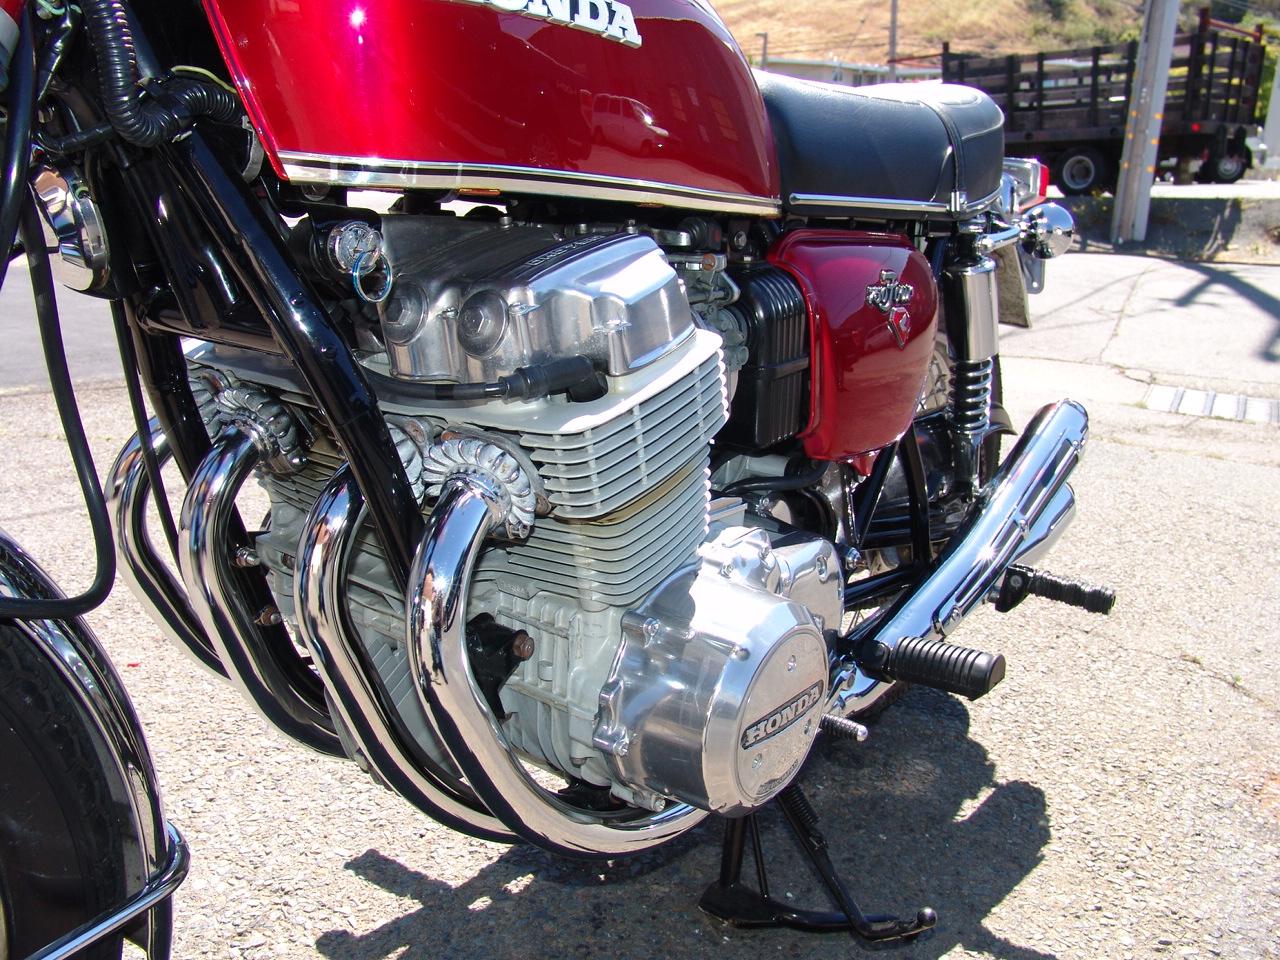 1970 Honda CB750 K0 Restoration